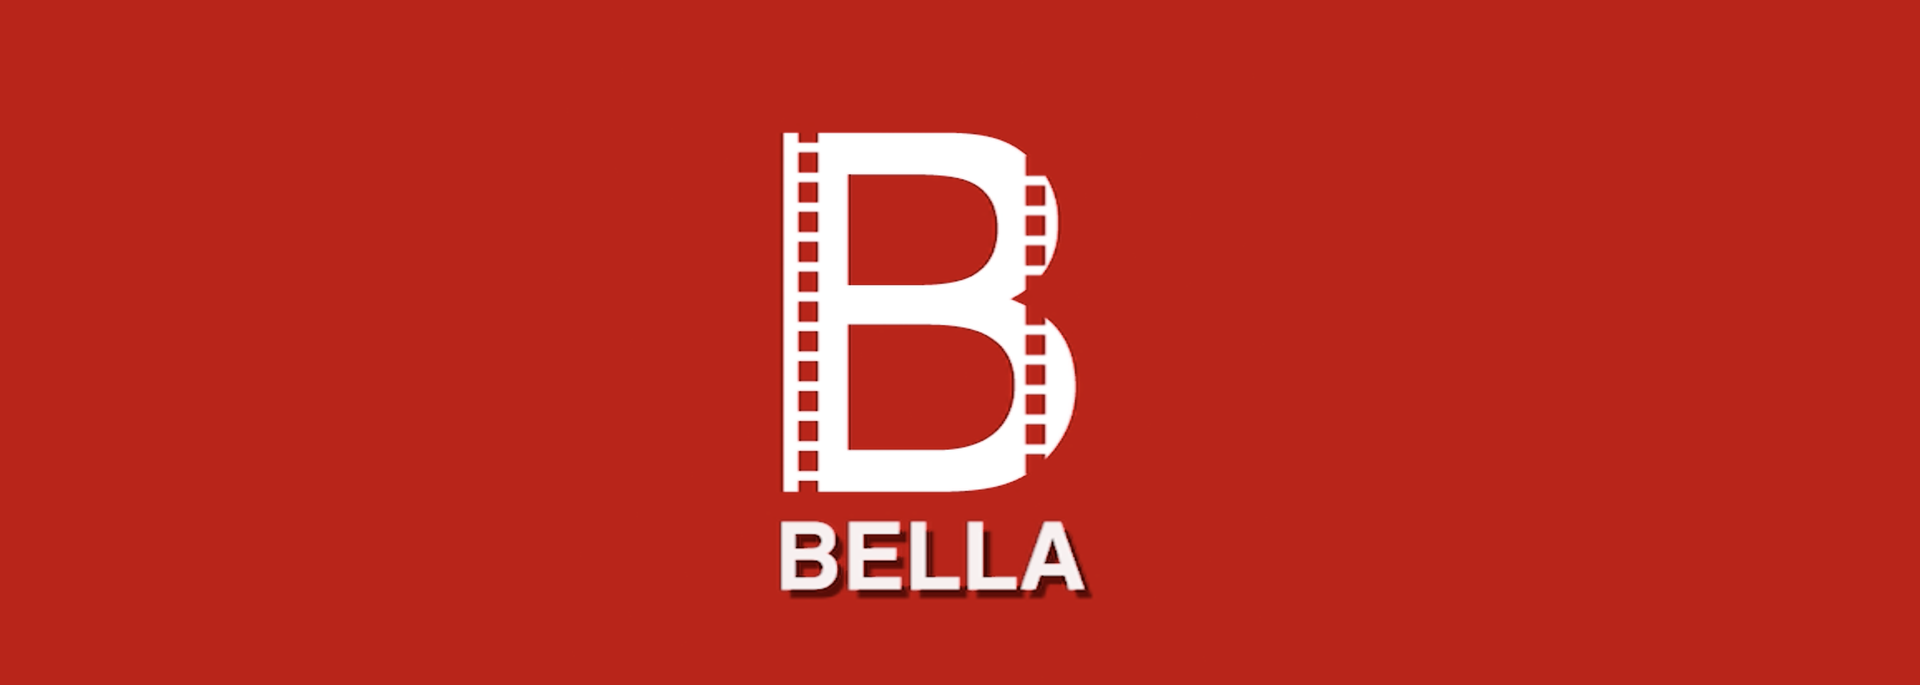 BELLA channel